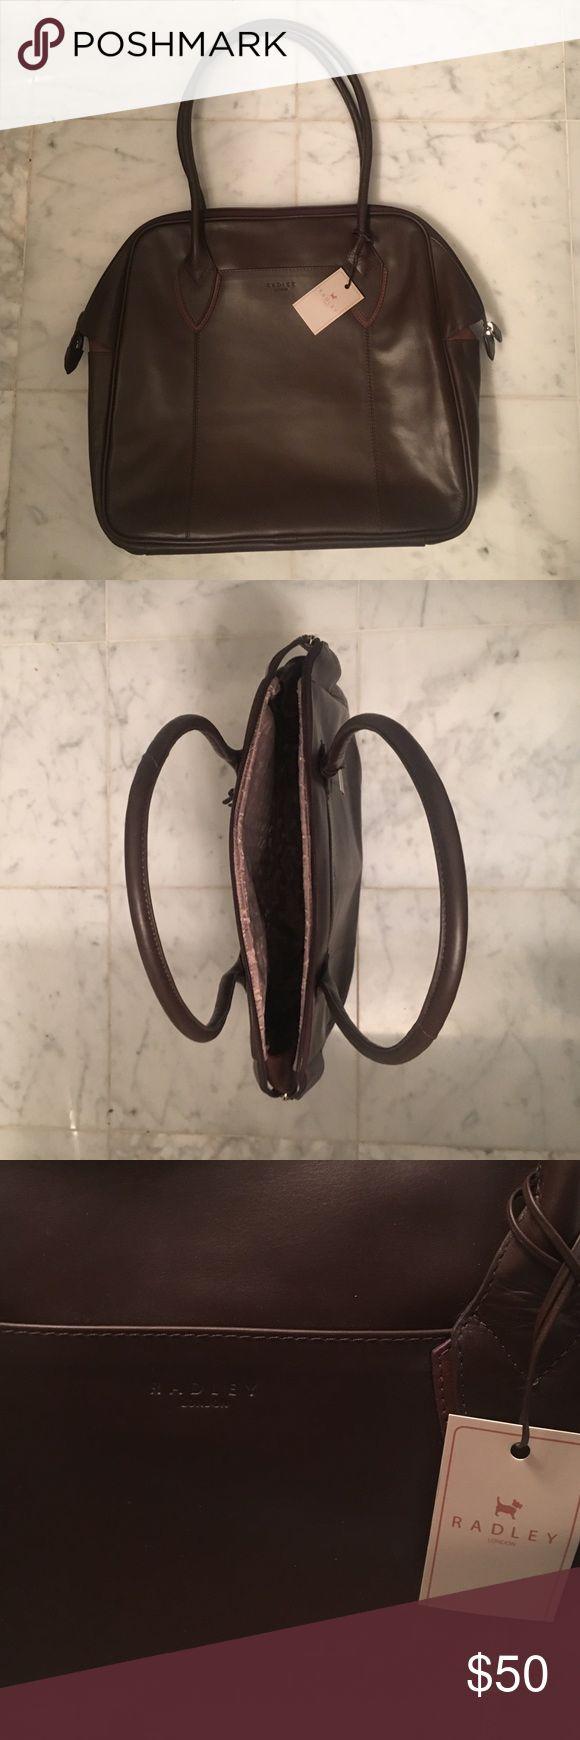 Never been used Radley handbag Dark brown Radley London Handbag. Tons of Space and 3 pockets! Radley London Bags Shoulder Bags